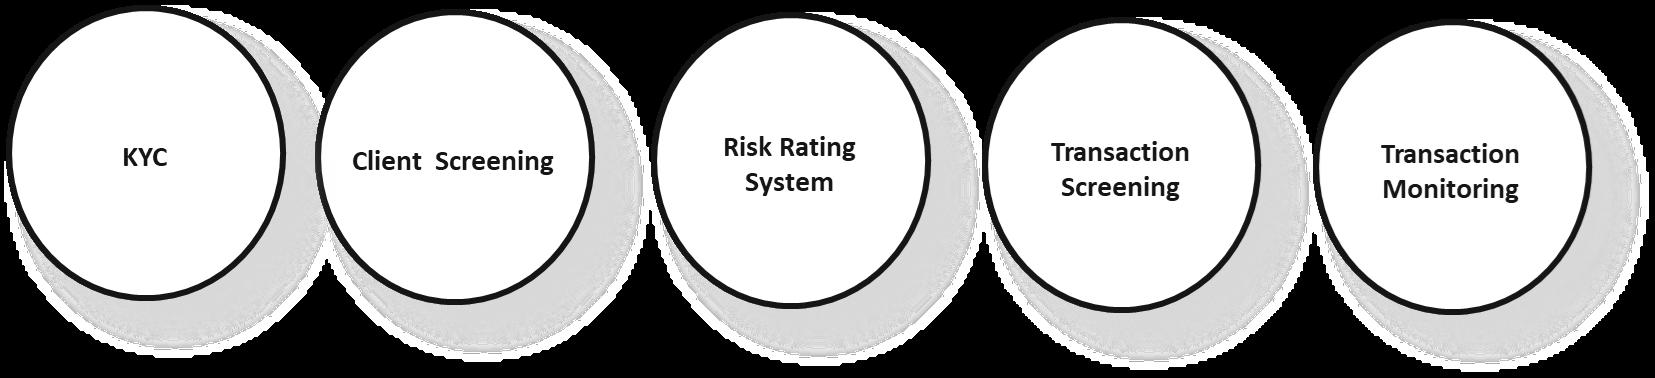 aml, kyc, client screening, risk screening, transaction screening, transaction monitoring, sanctions screening, compliance